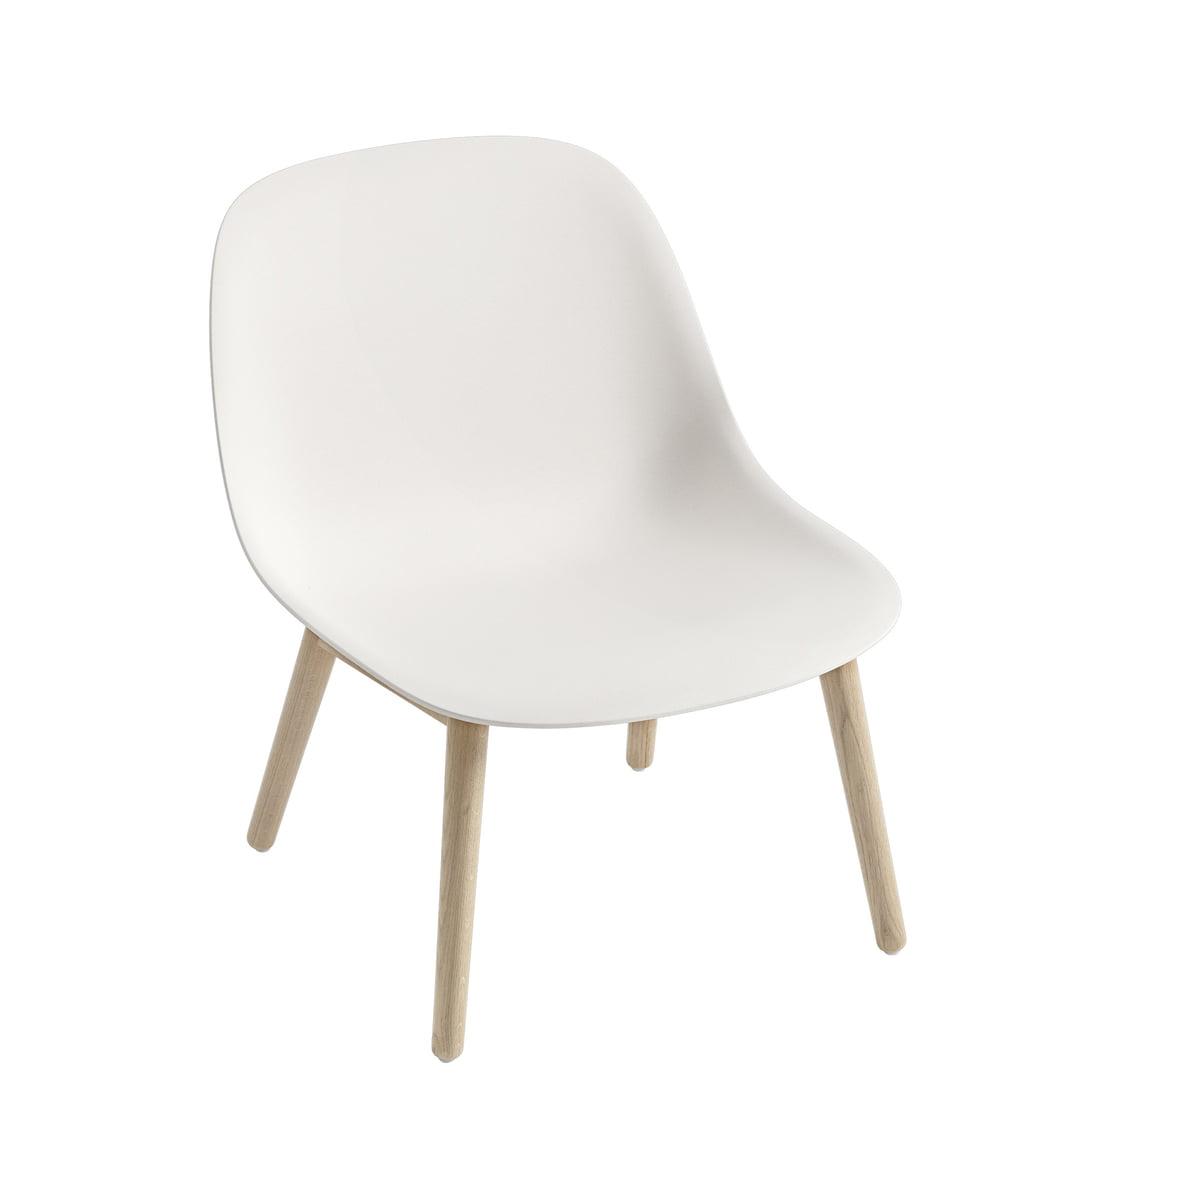 Lounge Stoel Retro.Muuto Fiber Lounge Chair Wood Base Connox